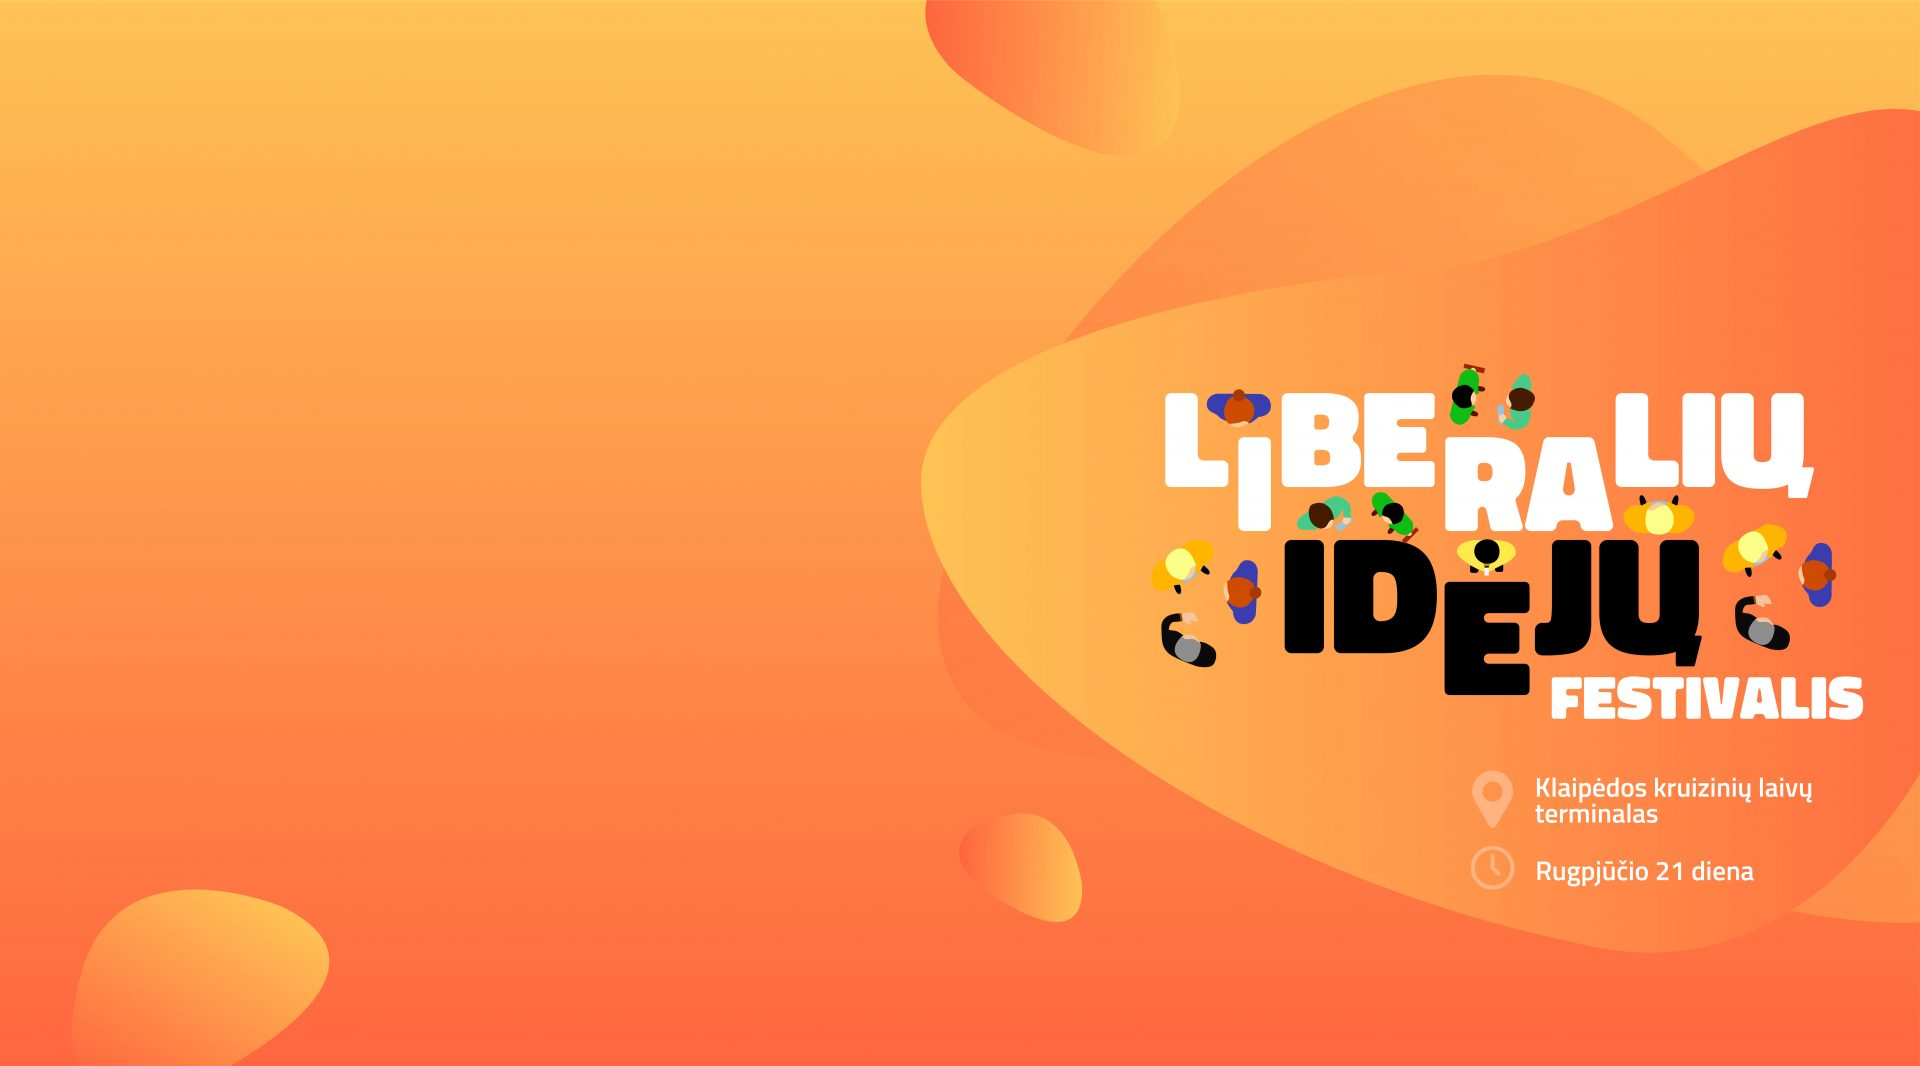 IDEJU FESTIVALIS 2021 | www cover-01